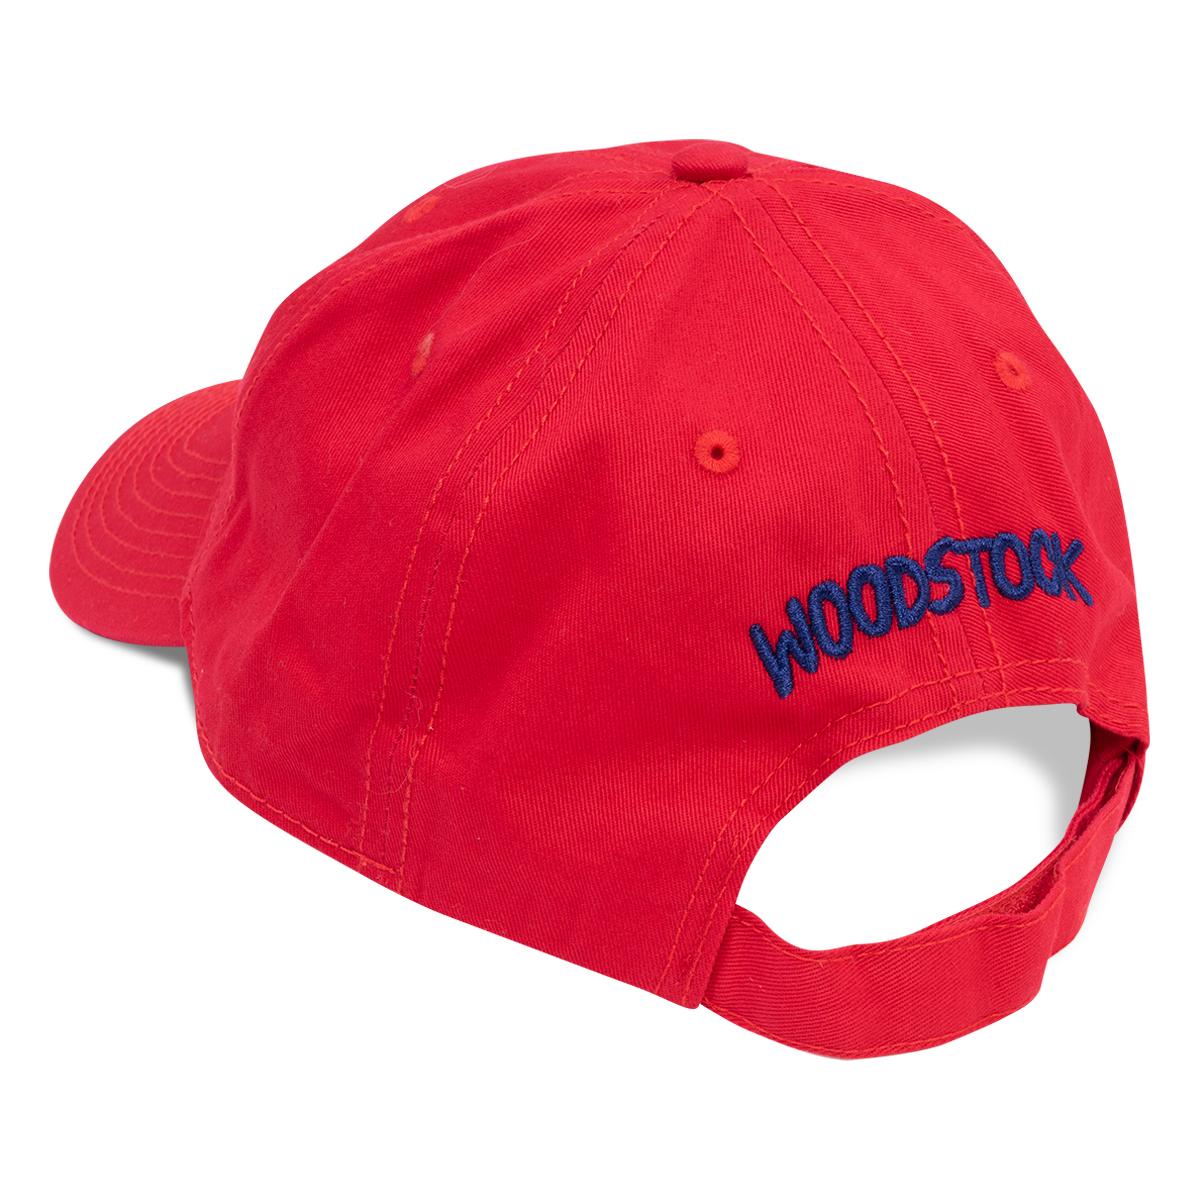 Woodstock 50th Anniversary Red Twill Cap